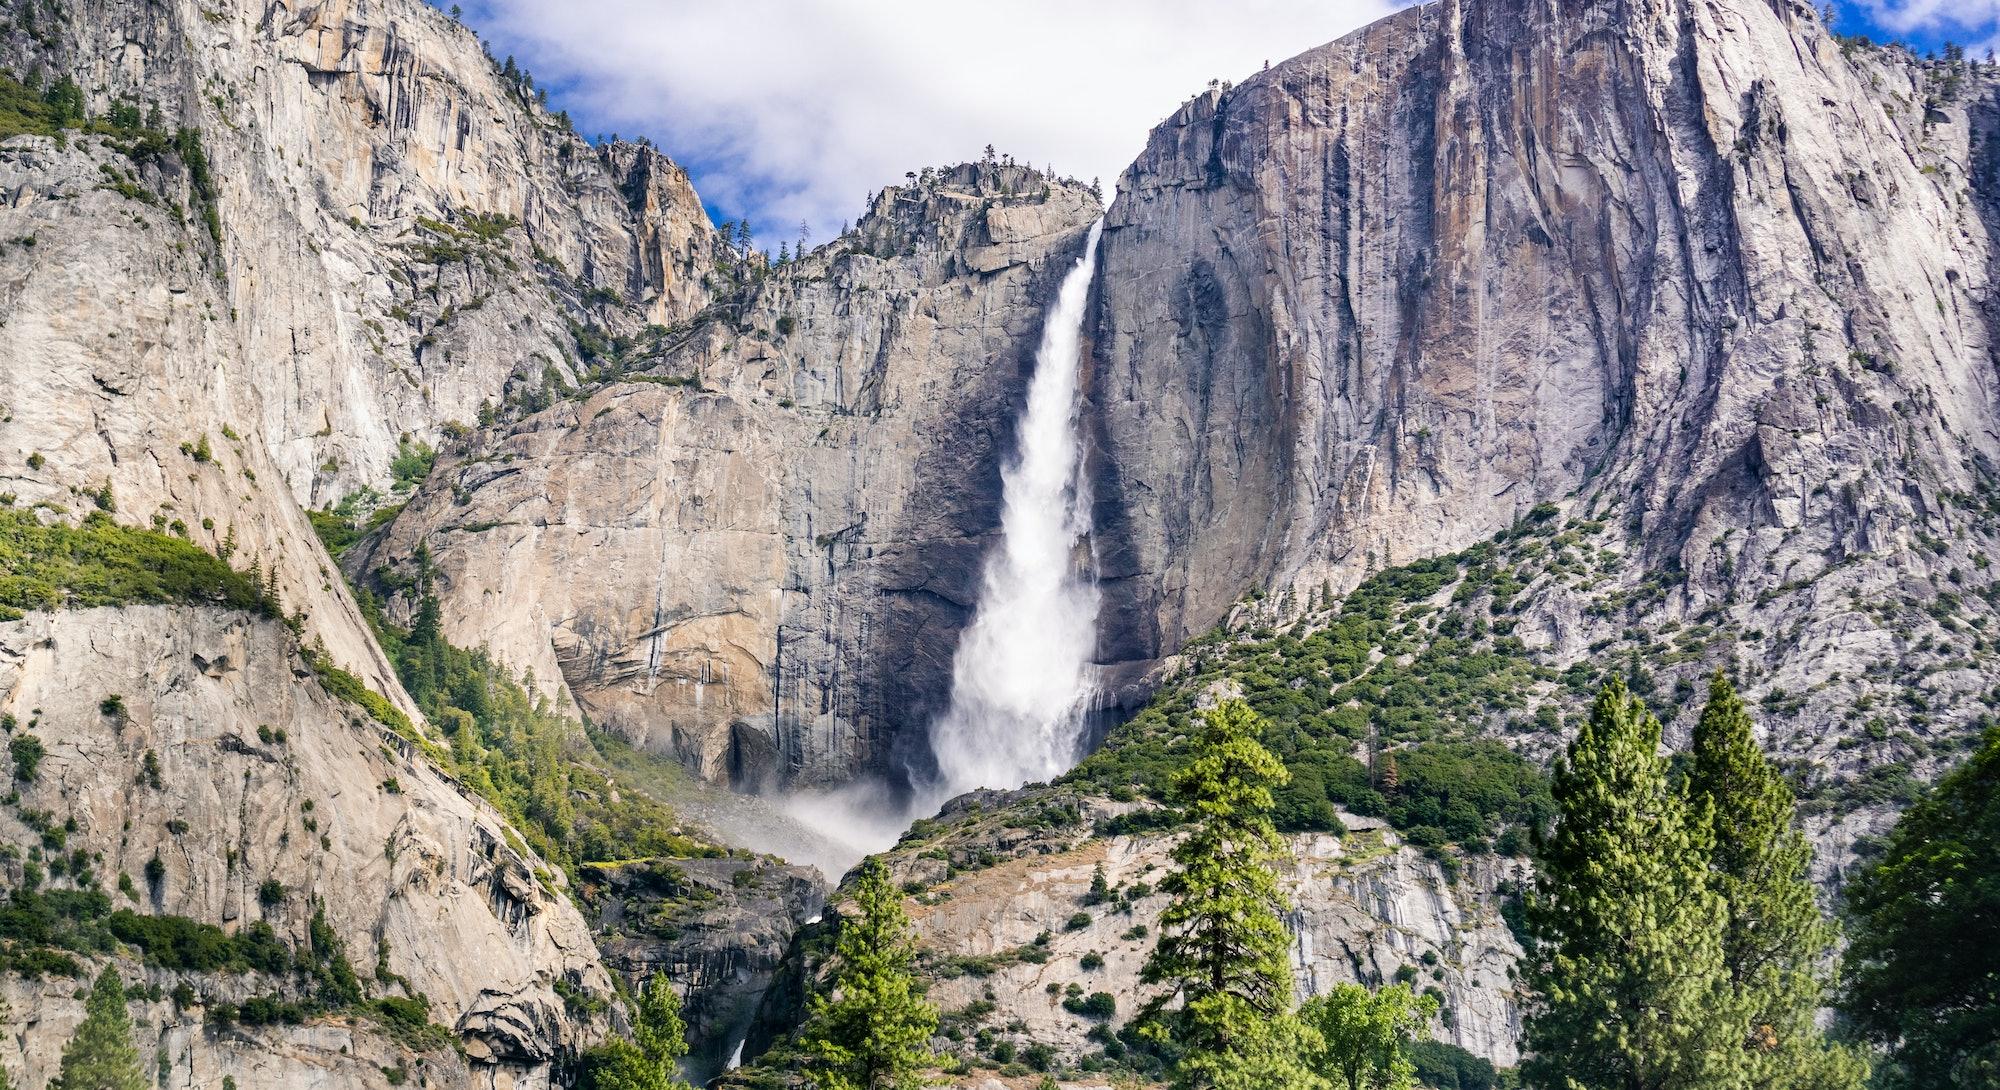 Upper Yosemite Falls as seen from Yosemite Valley, Yosemite National Park, California